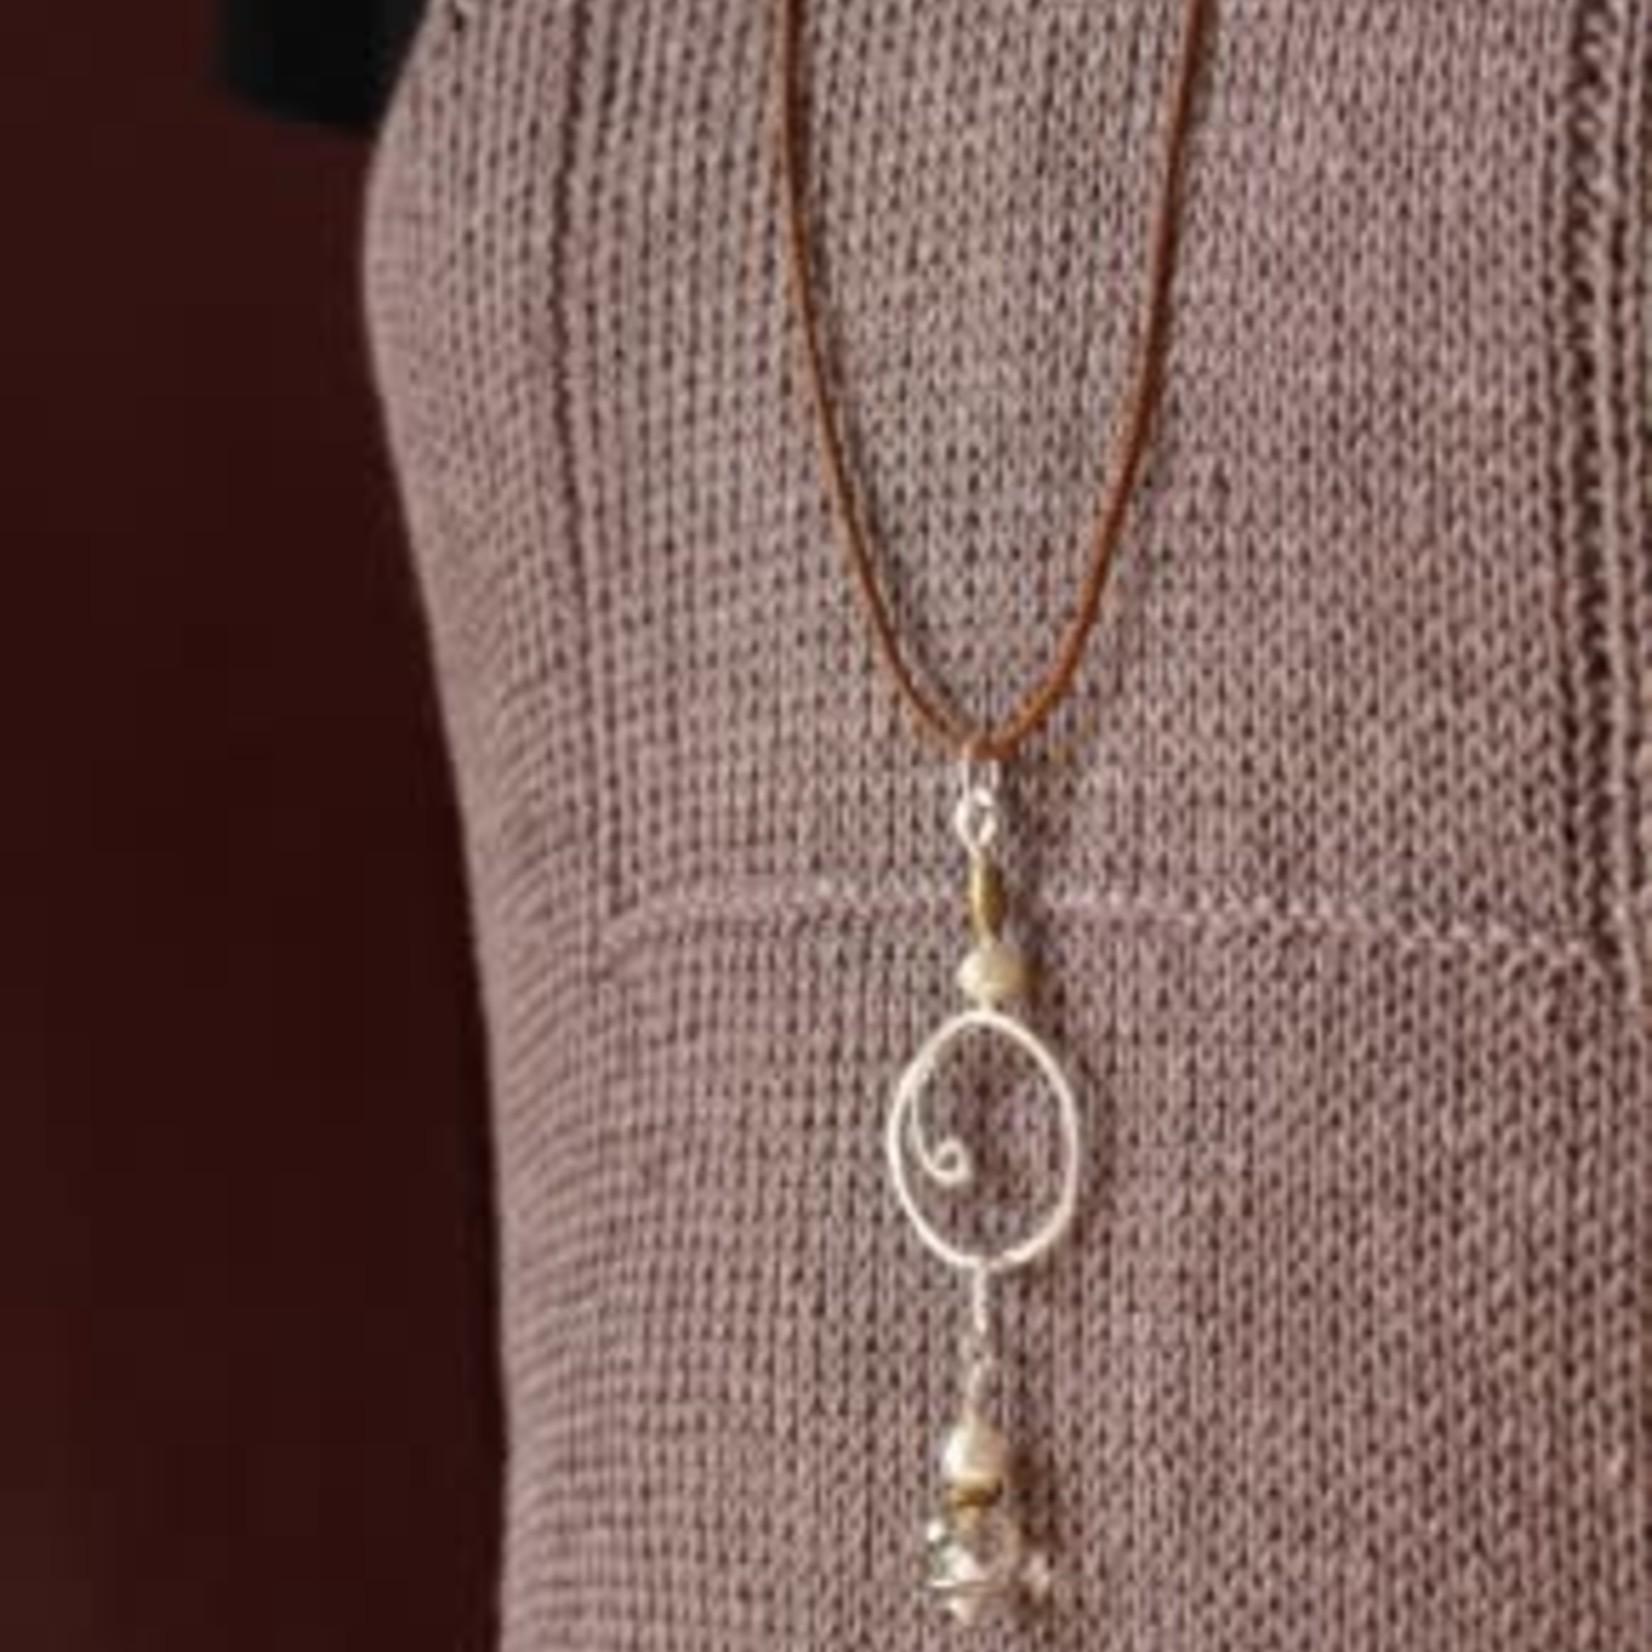 Wool & Wire Stitch Marker Necklace (Linen) by Wool & Wire